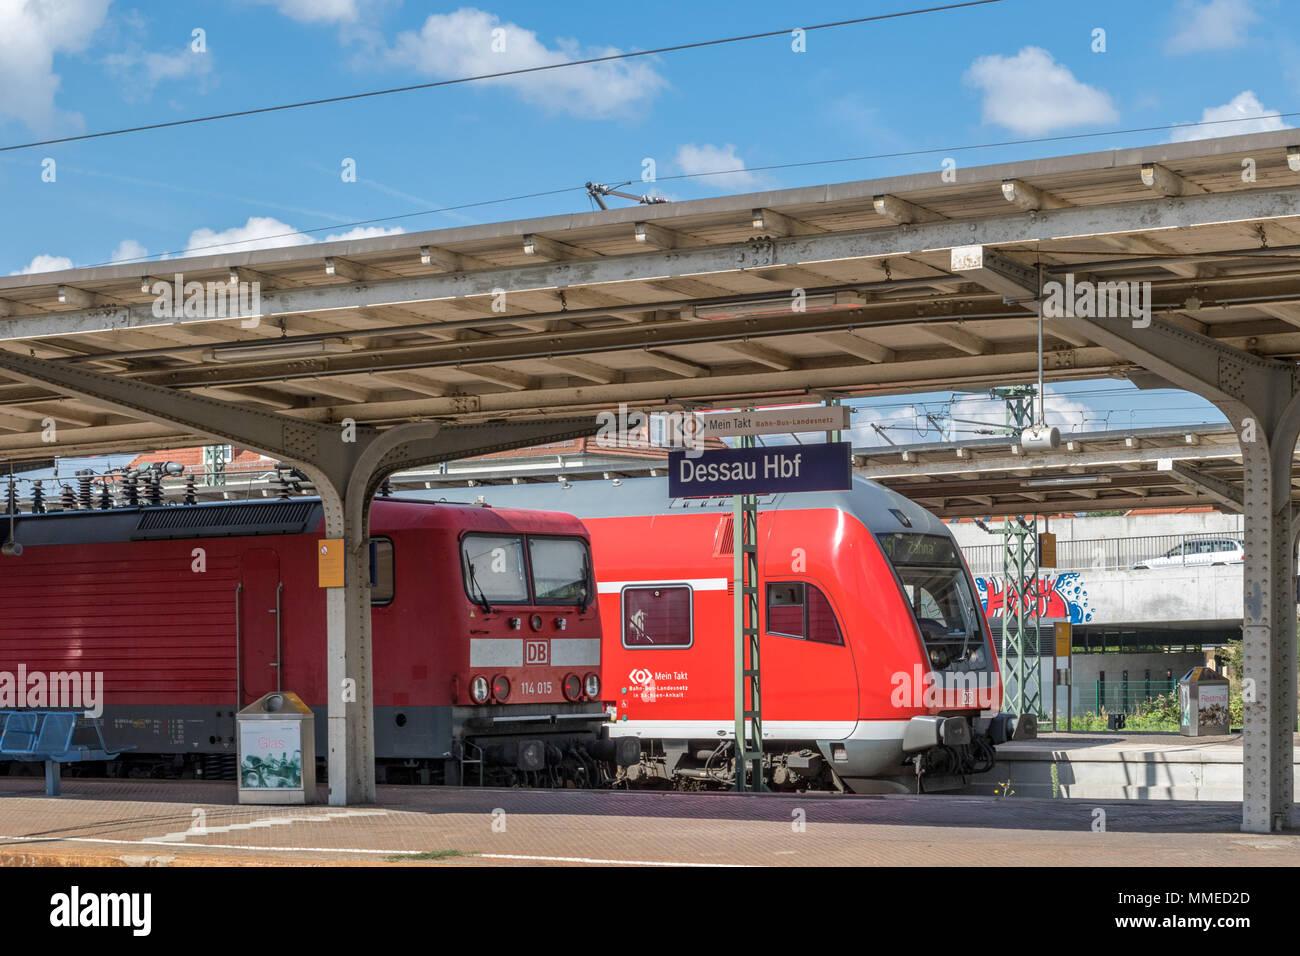 Regionalzuege im Dessauer Hauptbahnhof Stockbild